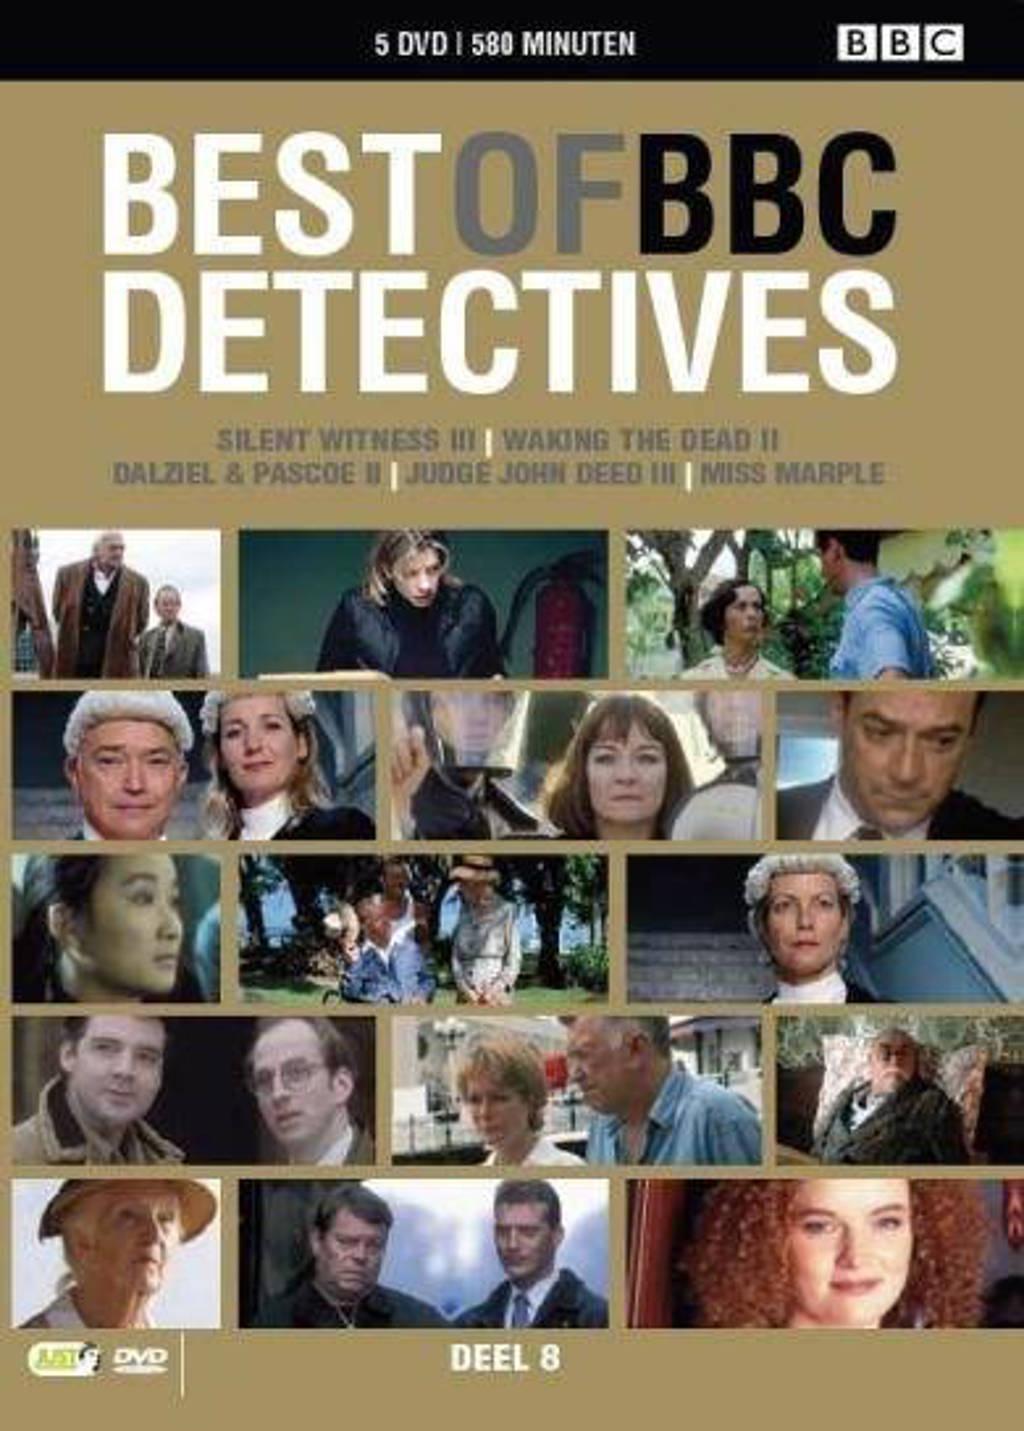 BBC detective box 8 (DVD)